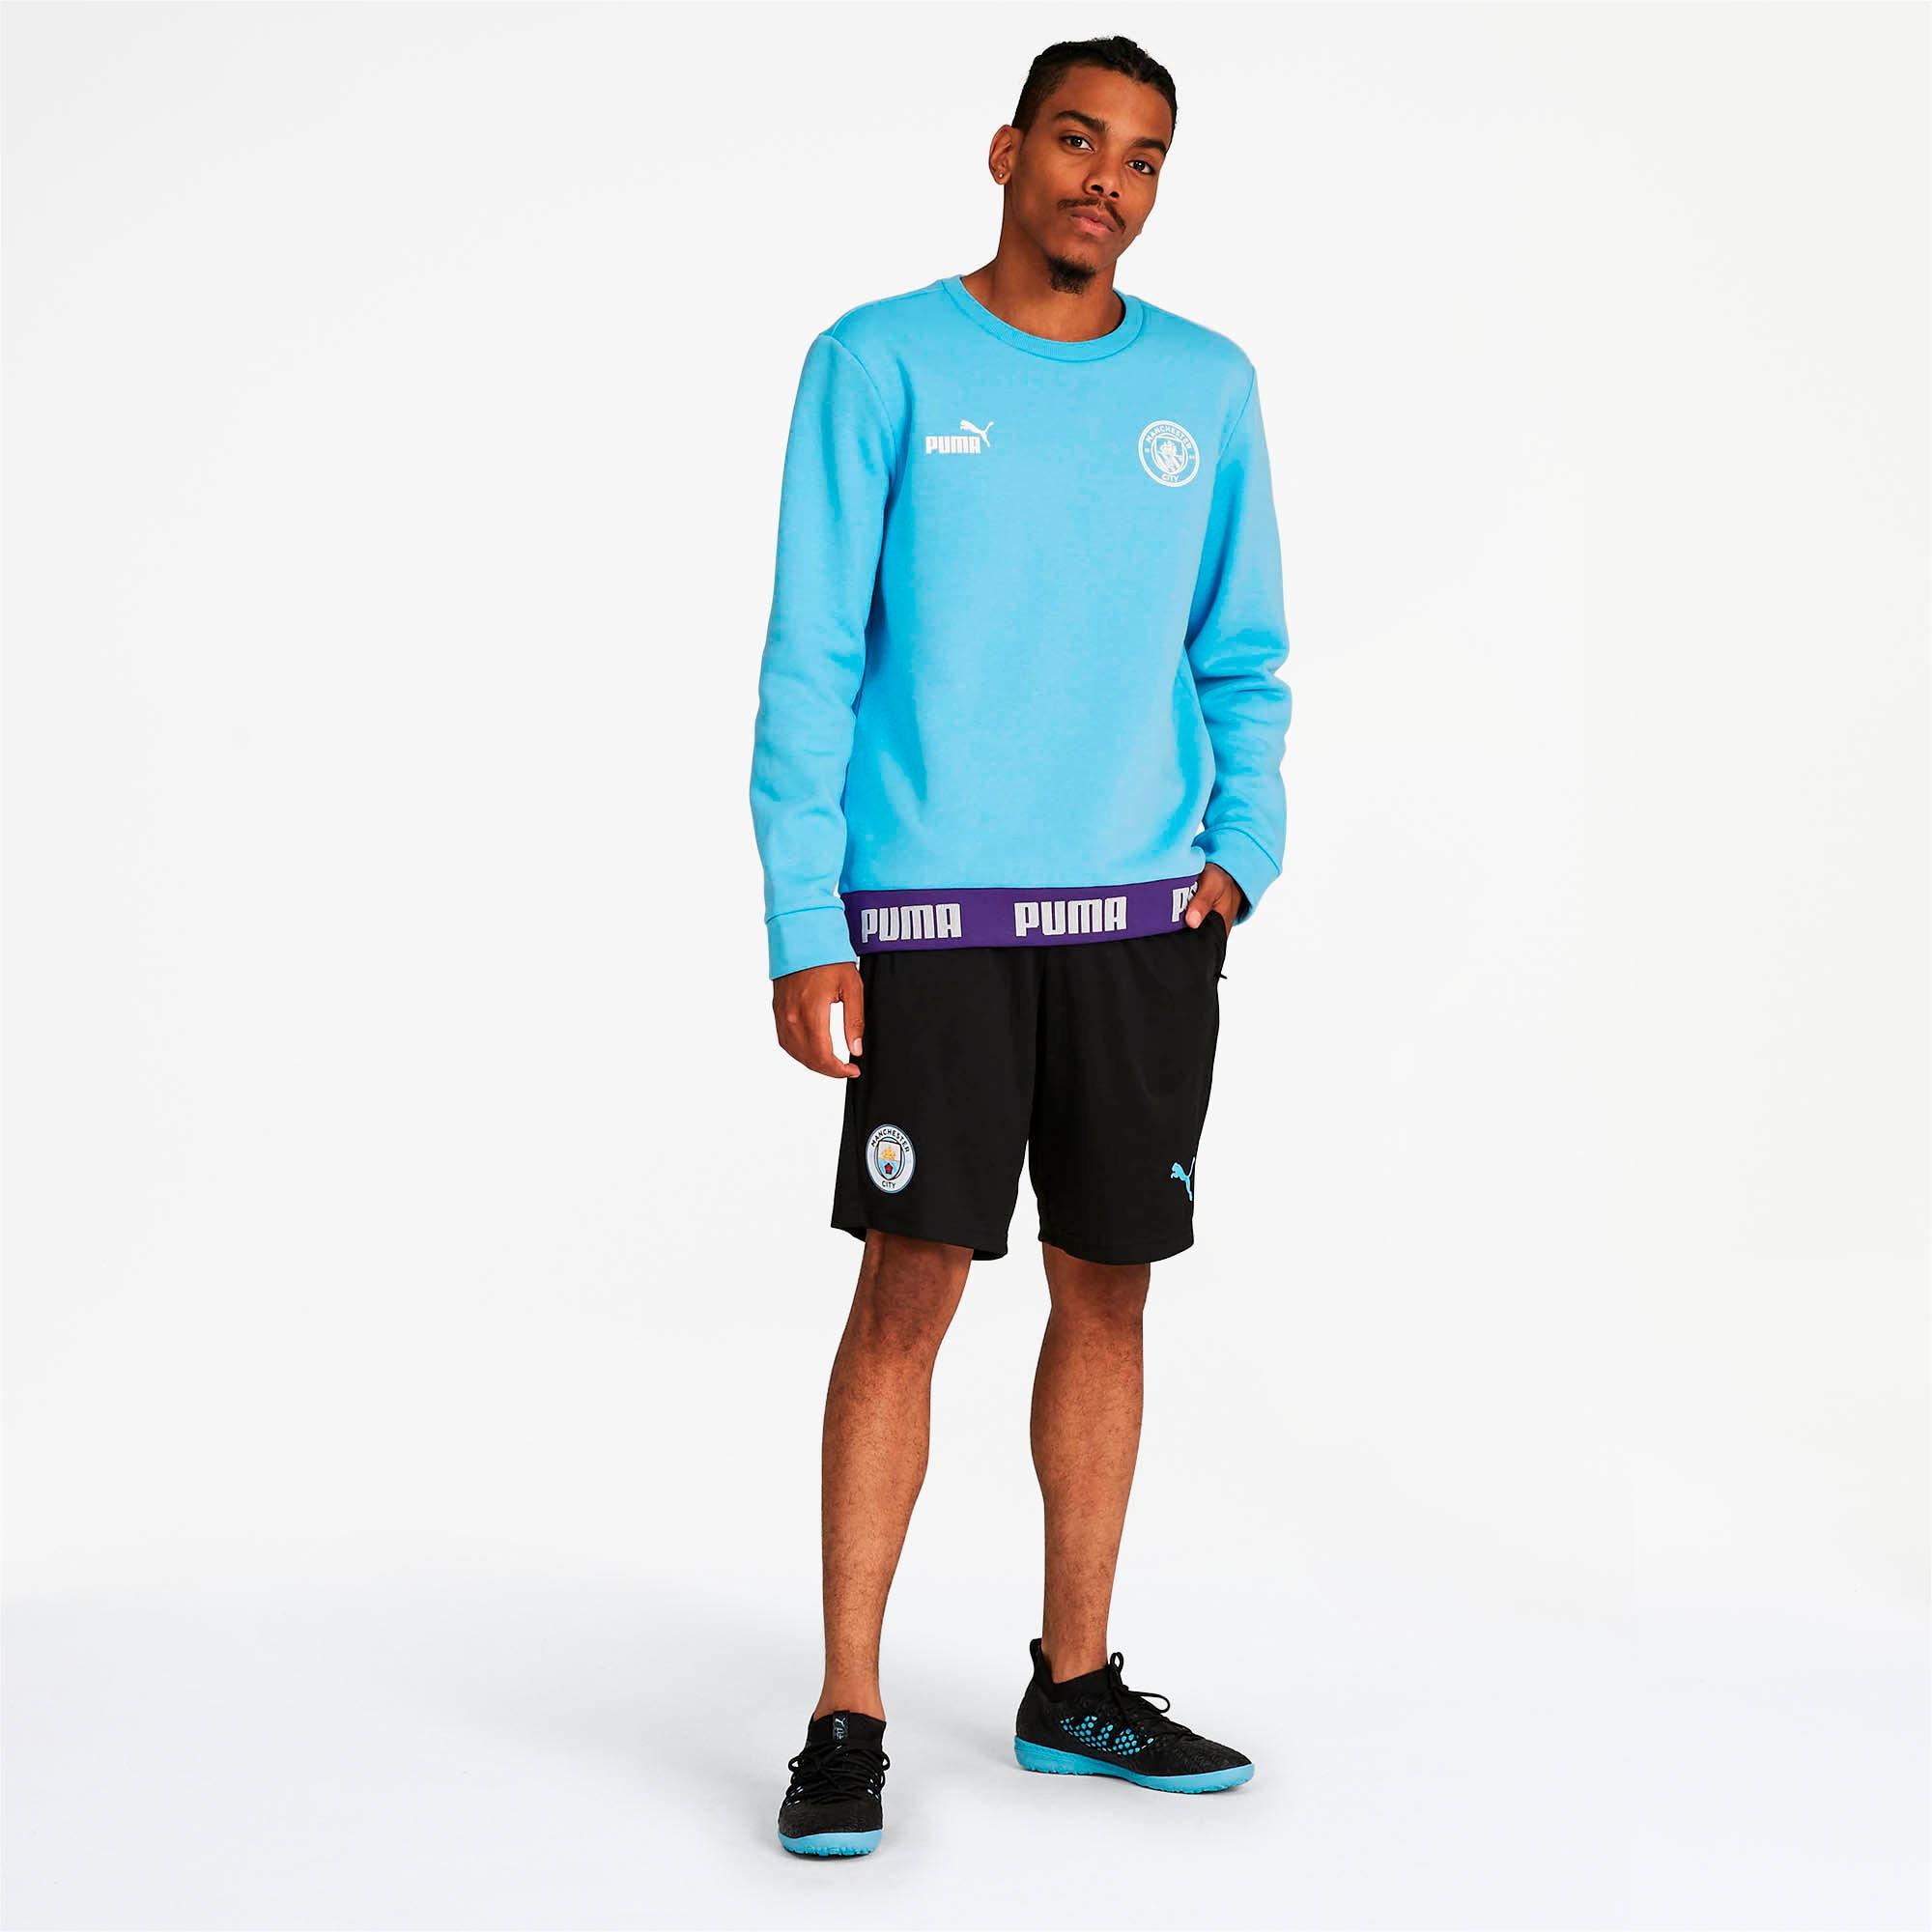 Thumbnail 3 of Manchester City FC FtblCulture Men's Sweatshirt, Team Light Blue-Puma White, medium